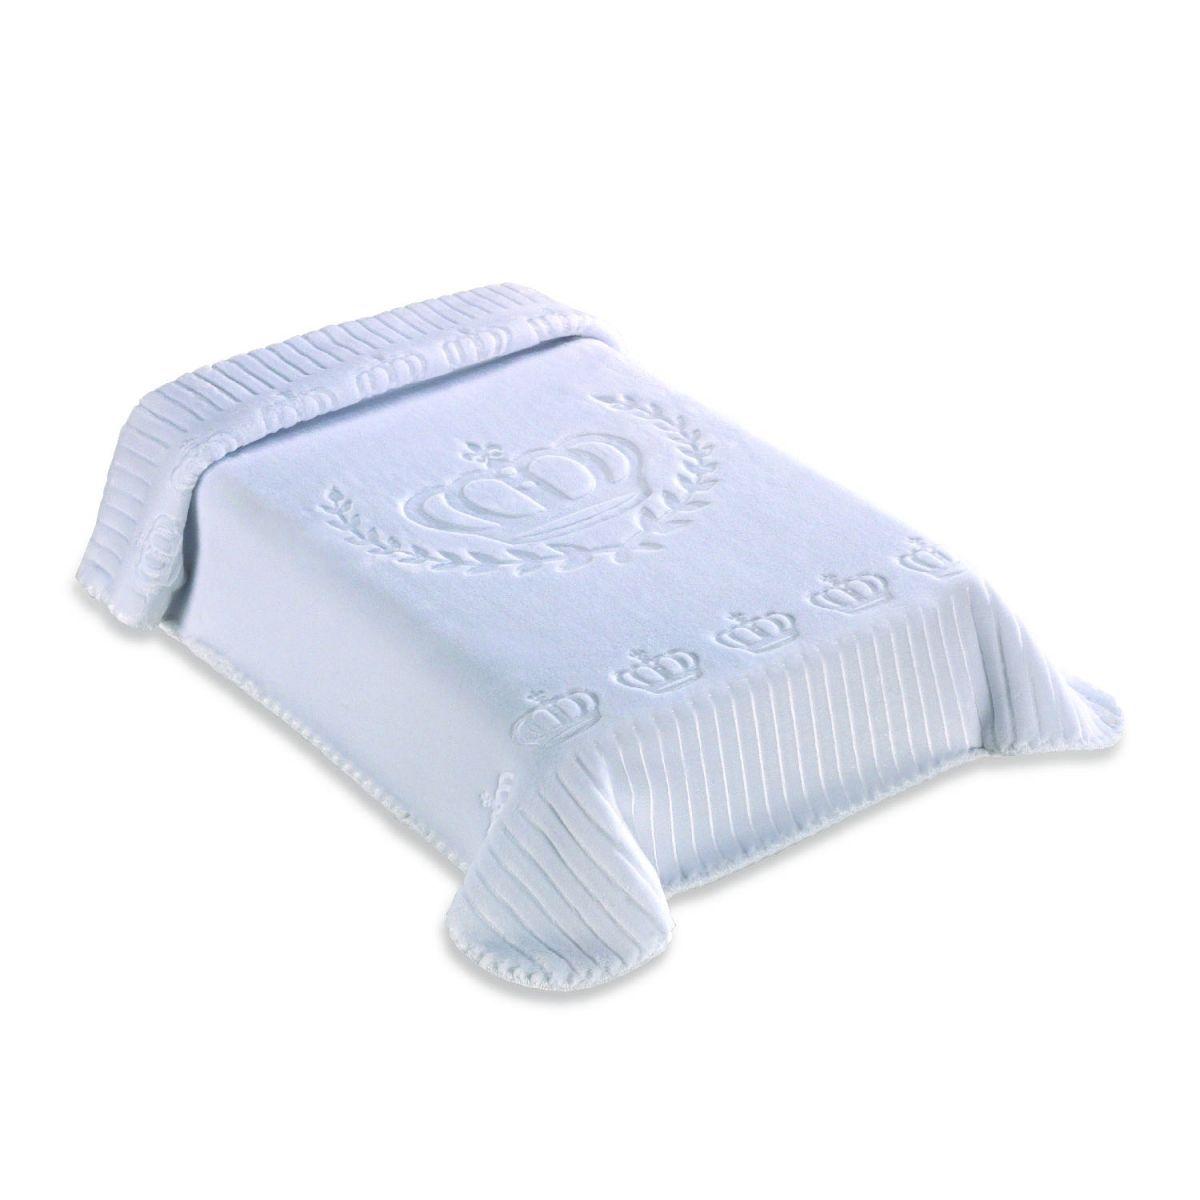 Cobertor Exclusive Unique Azul 44199 Colibri